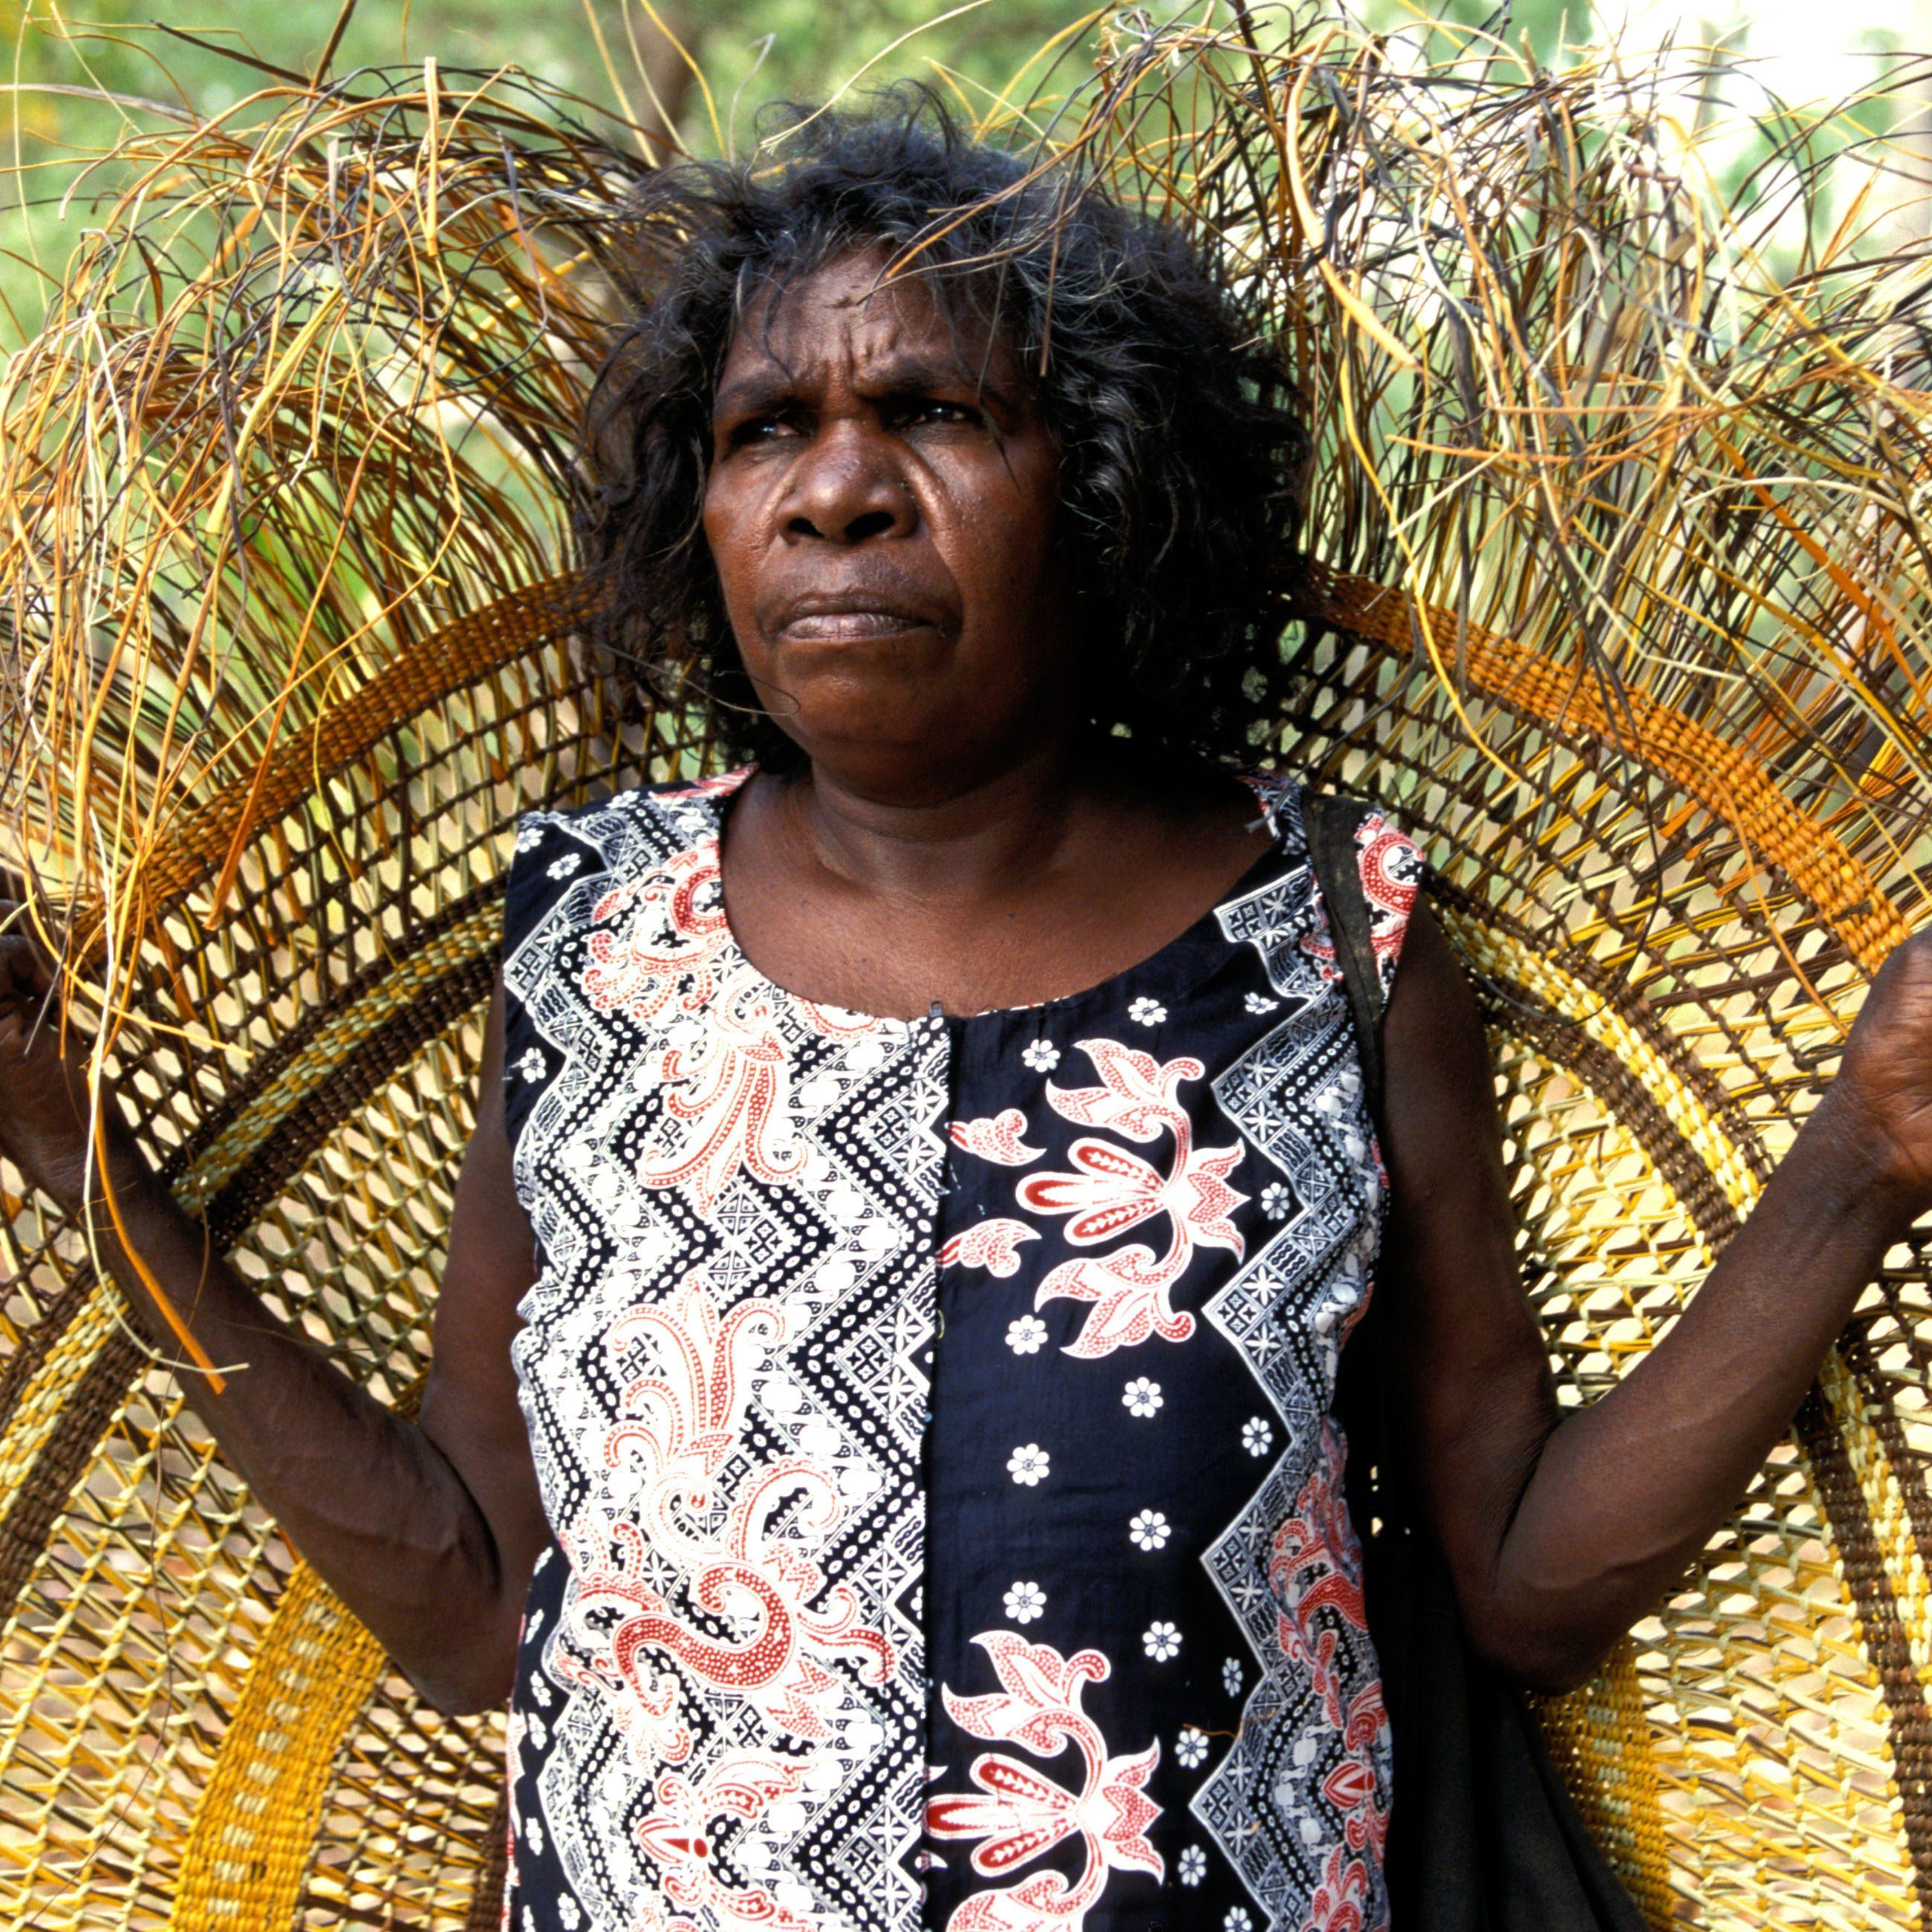 AXCFDE Aboriginal woman artist Judy Baypungnalala with traditional pandanus mat she has woven Ramingining Arnhem Land NT Australia